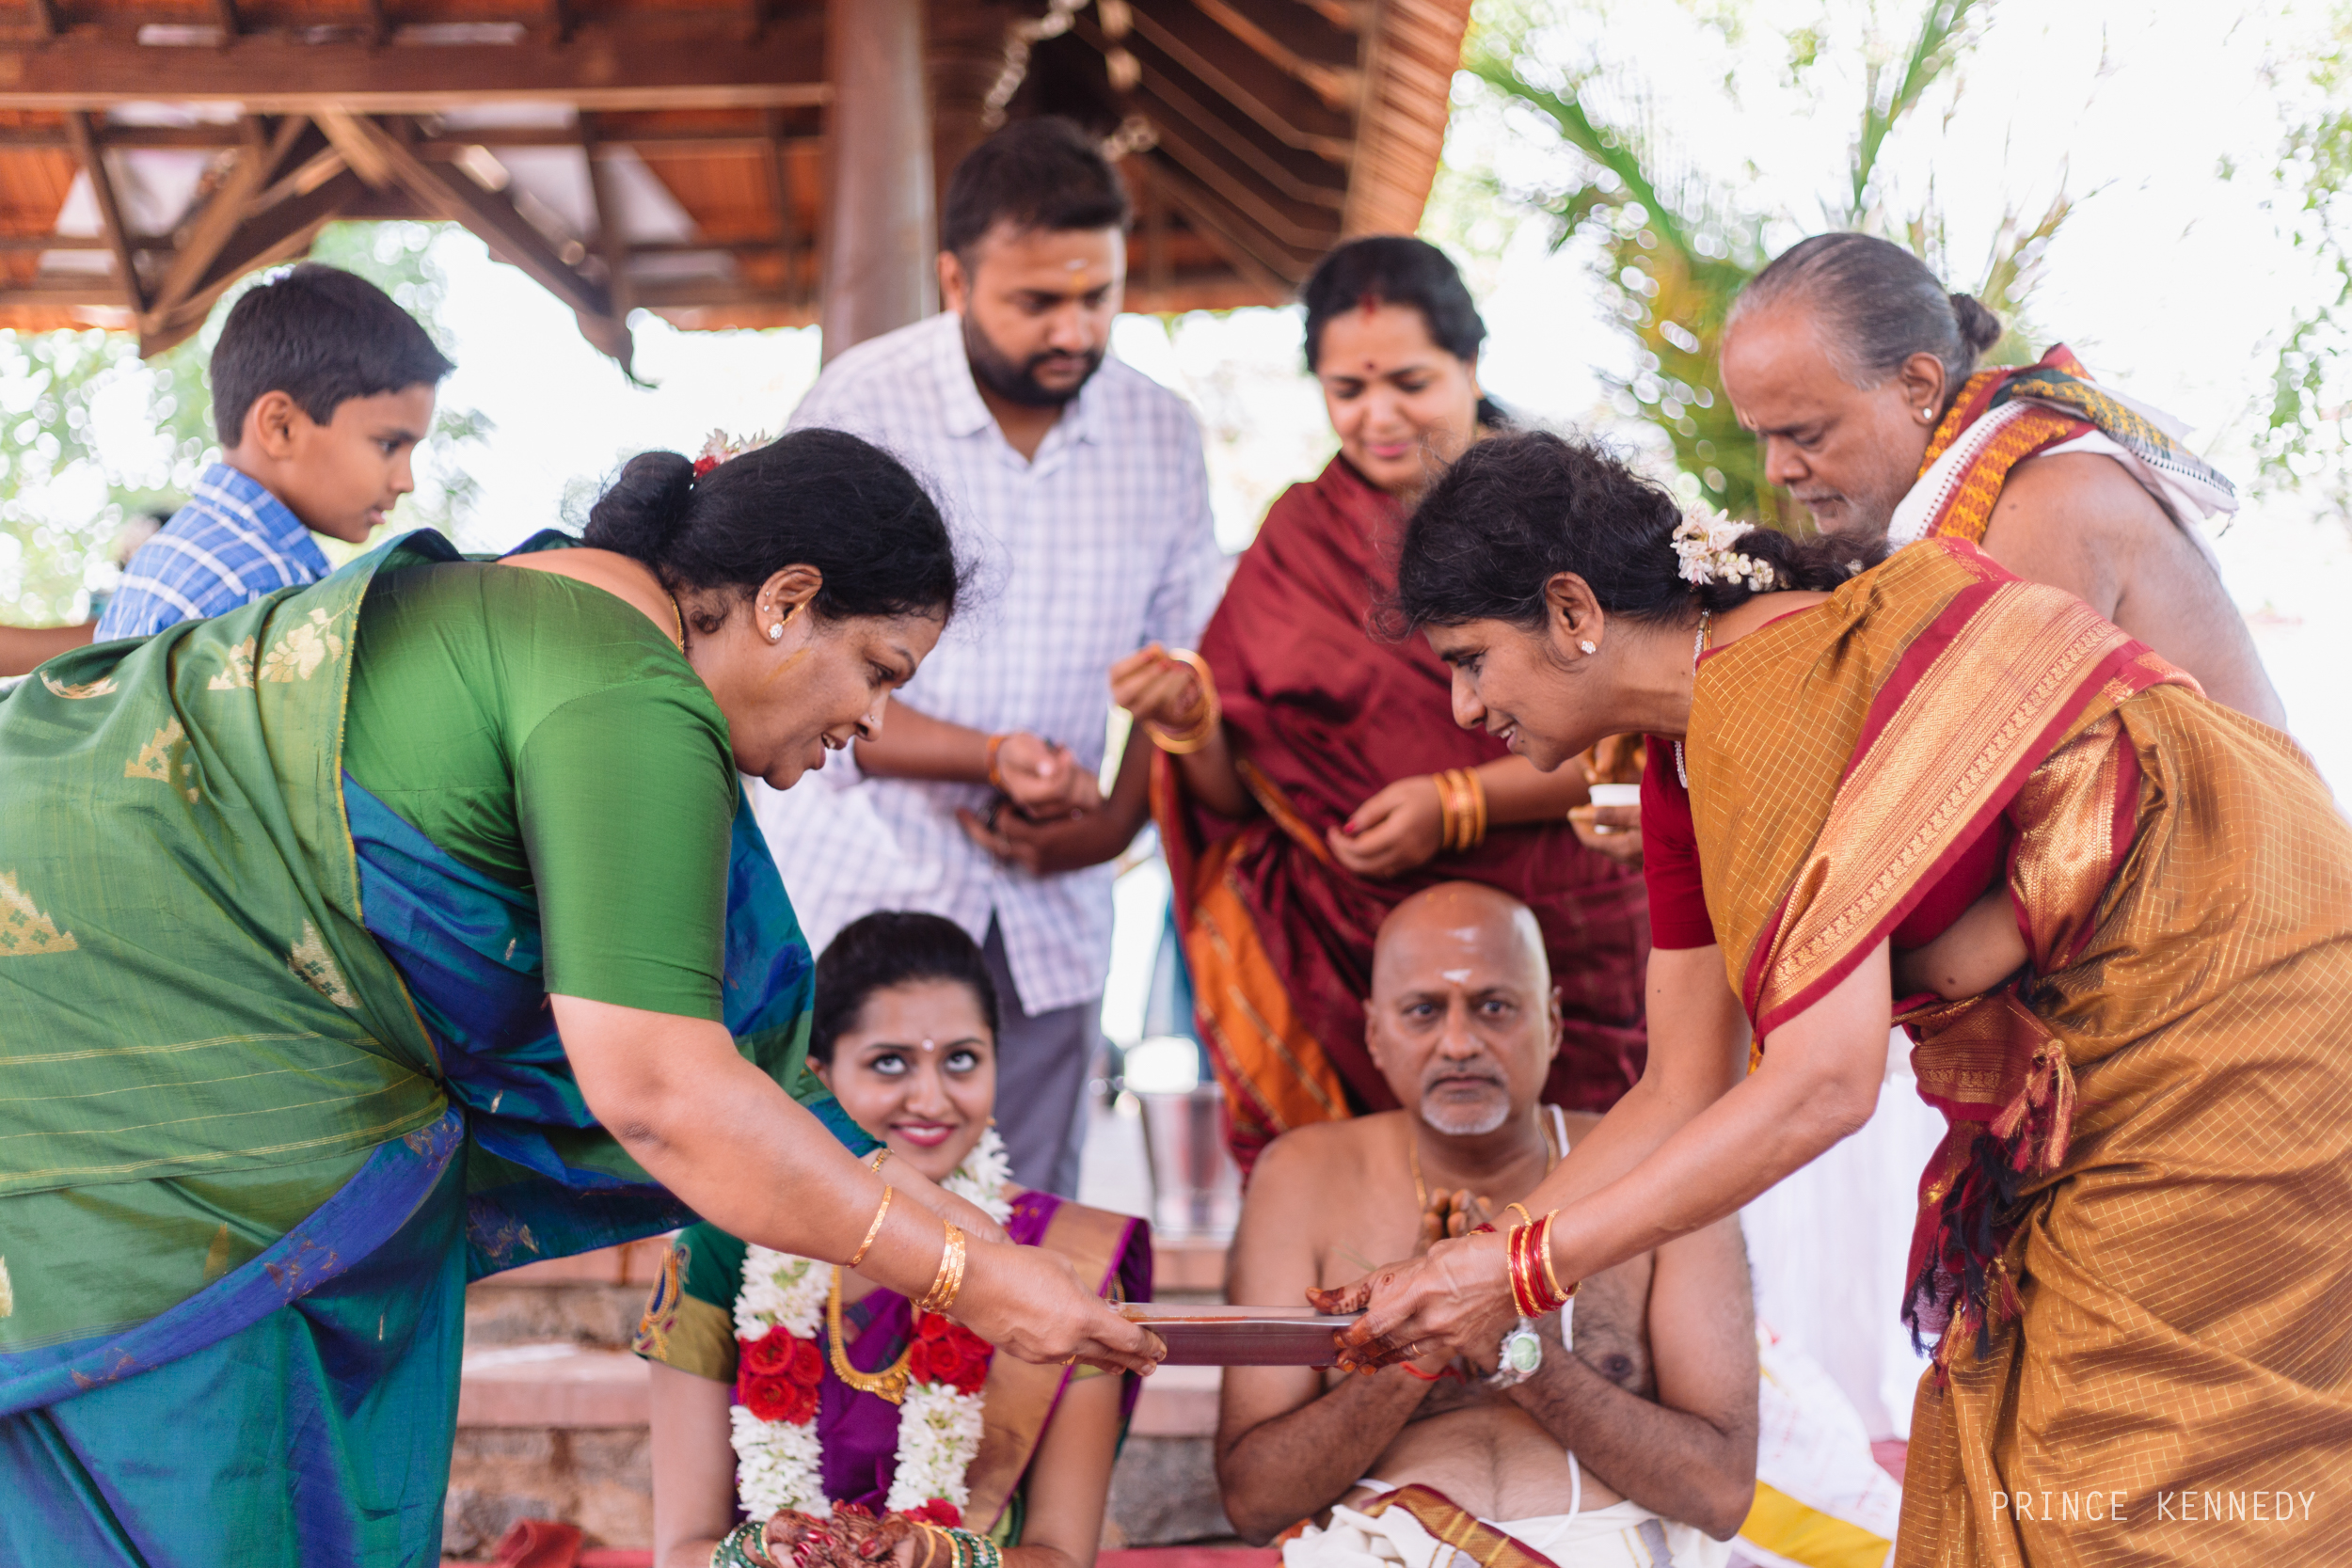 Athmajja-Nithesh-Engagement-Couple-Portrait-Portraiture-Wedding-Couple-Portrait-Chennai-Photographer-Candid-Photography-Destination-Best-Prince-Kennedy-Photography-155.jpg